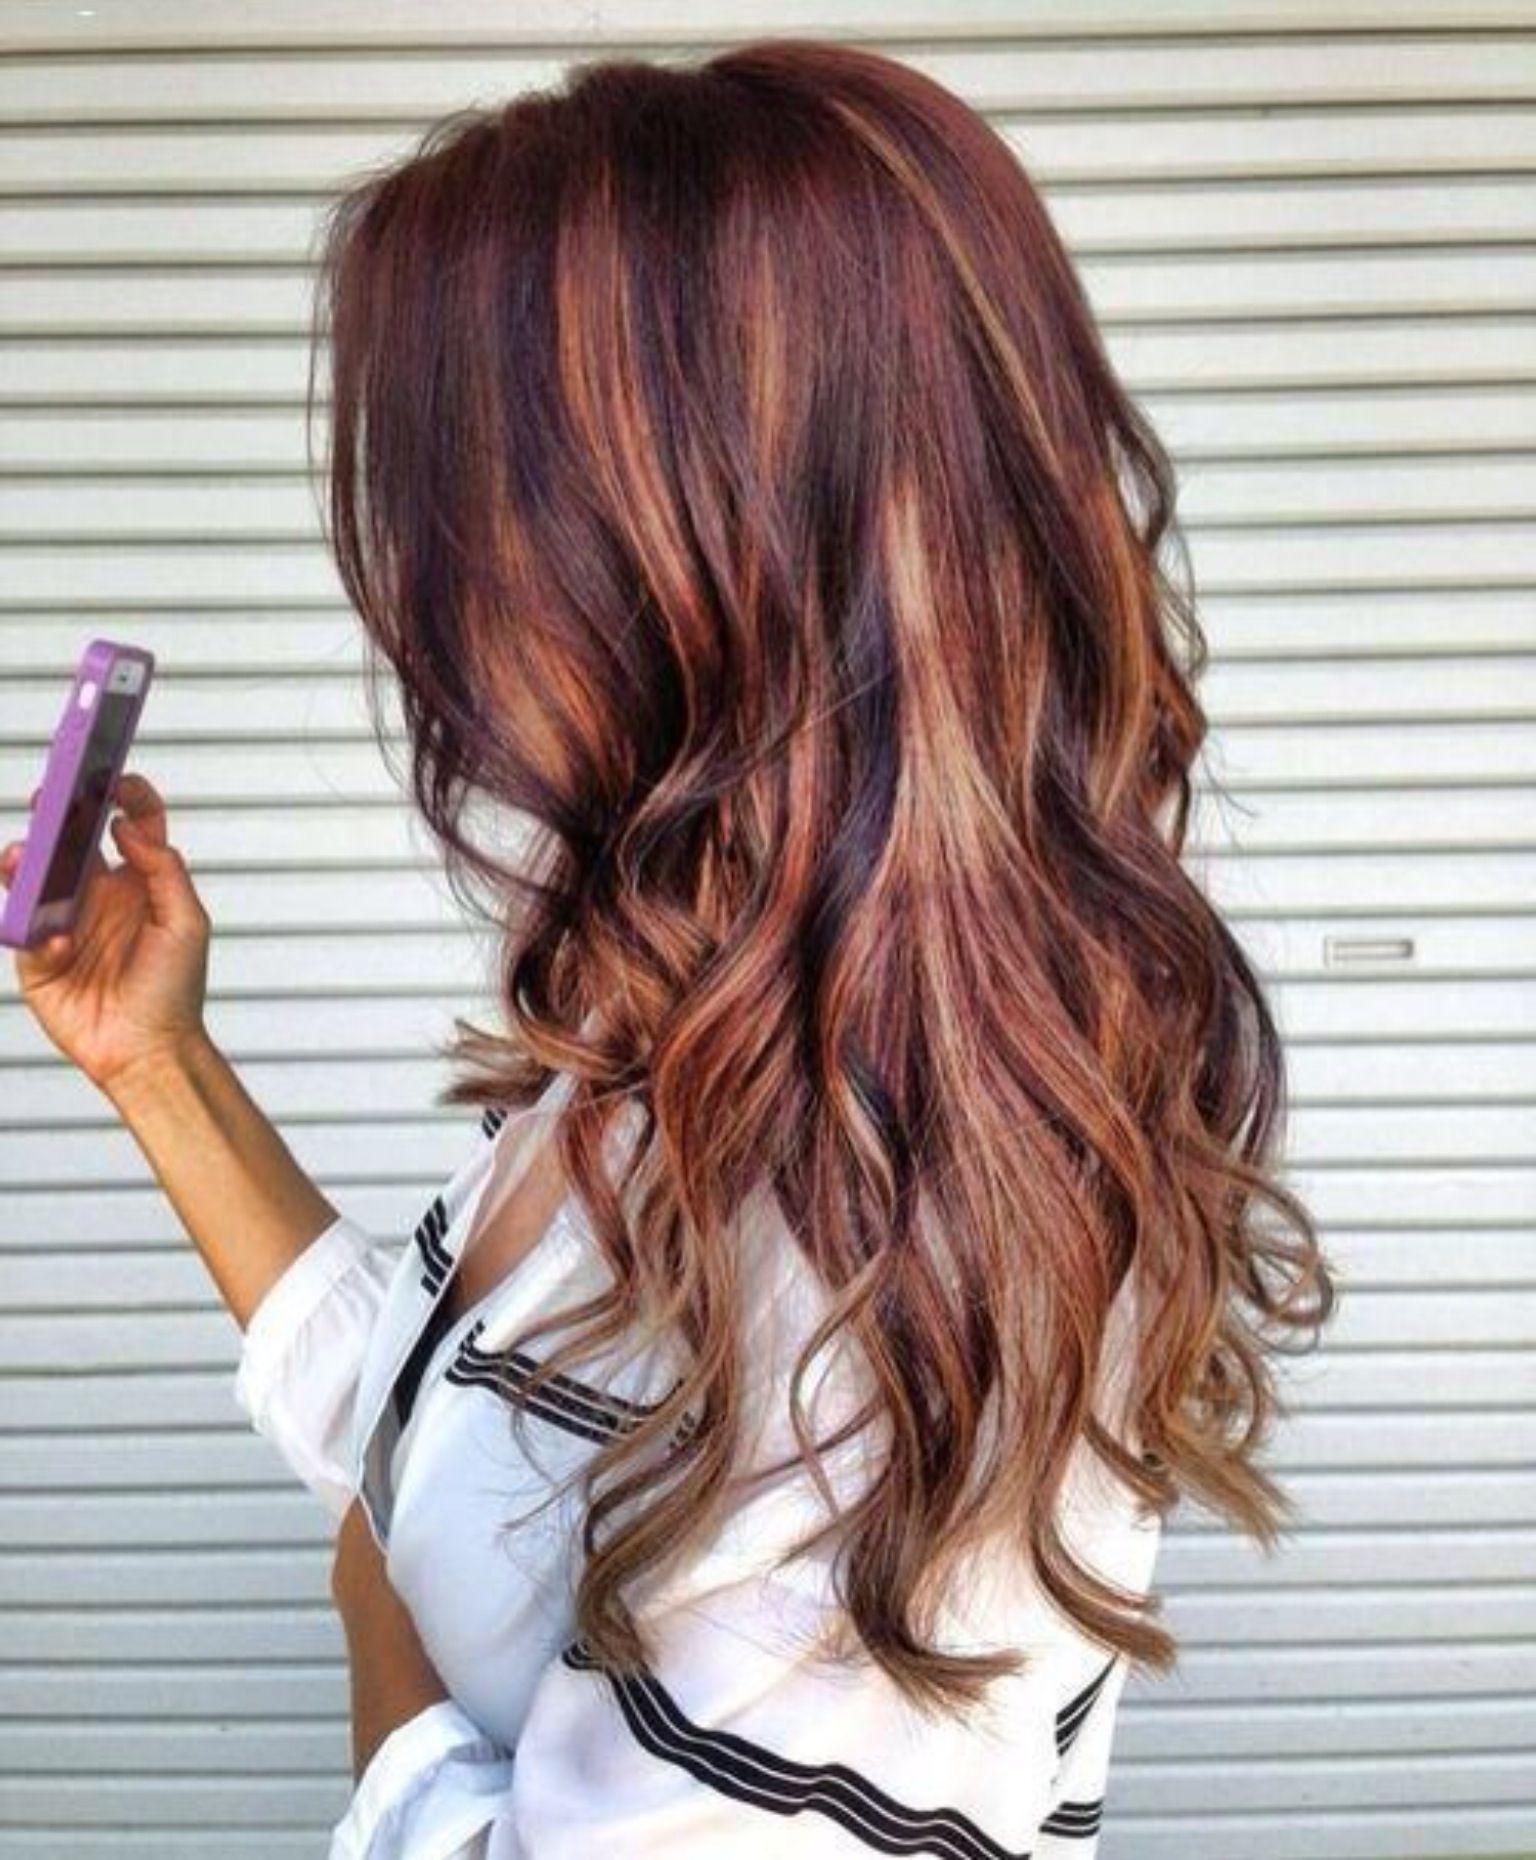 Great color fashionhair pinterest hair coloring